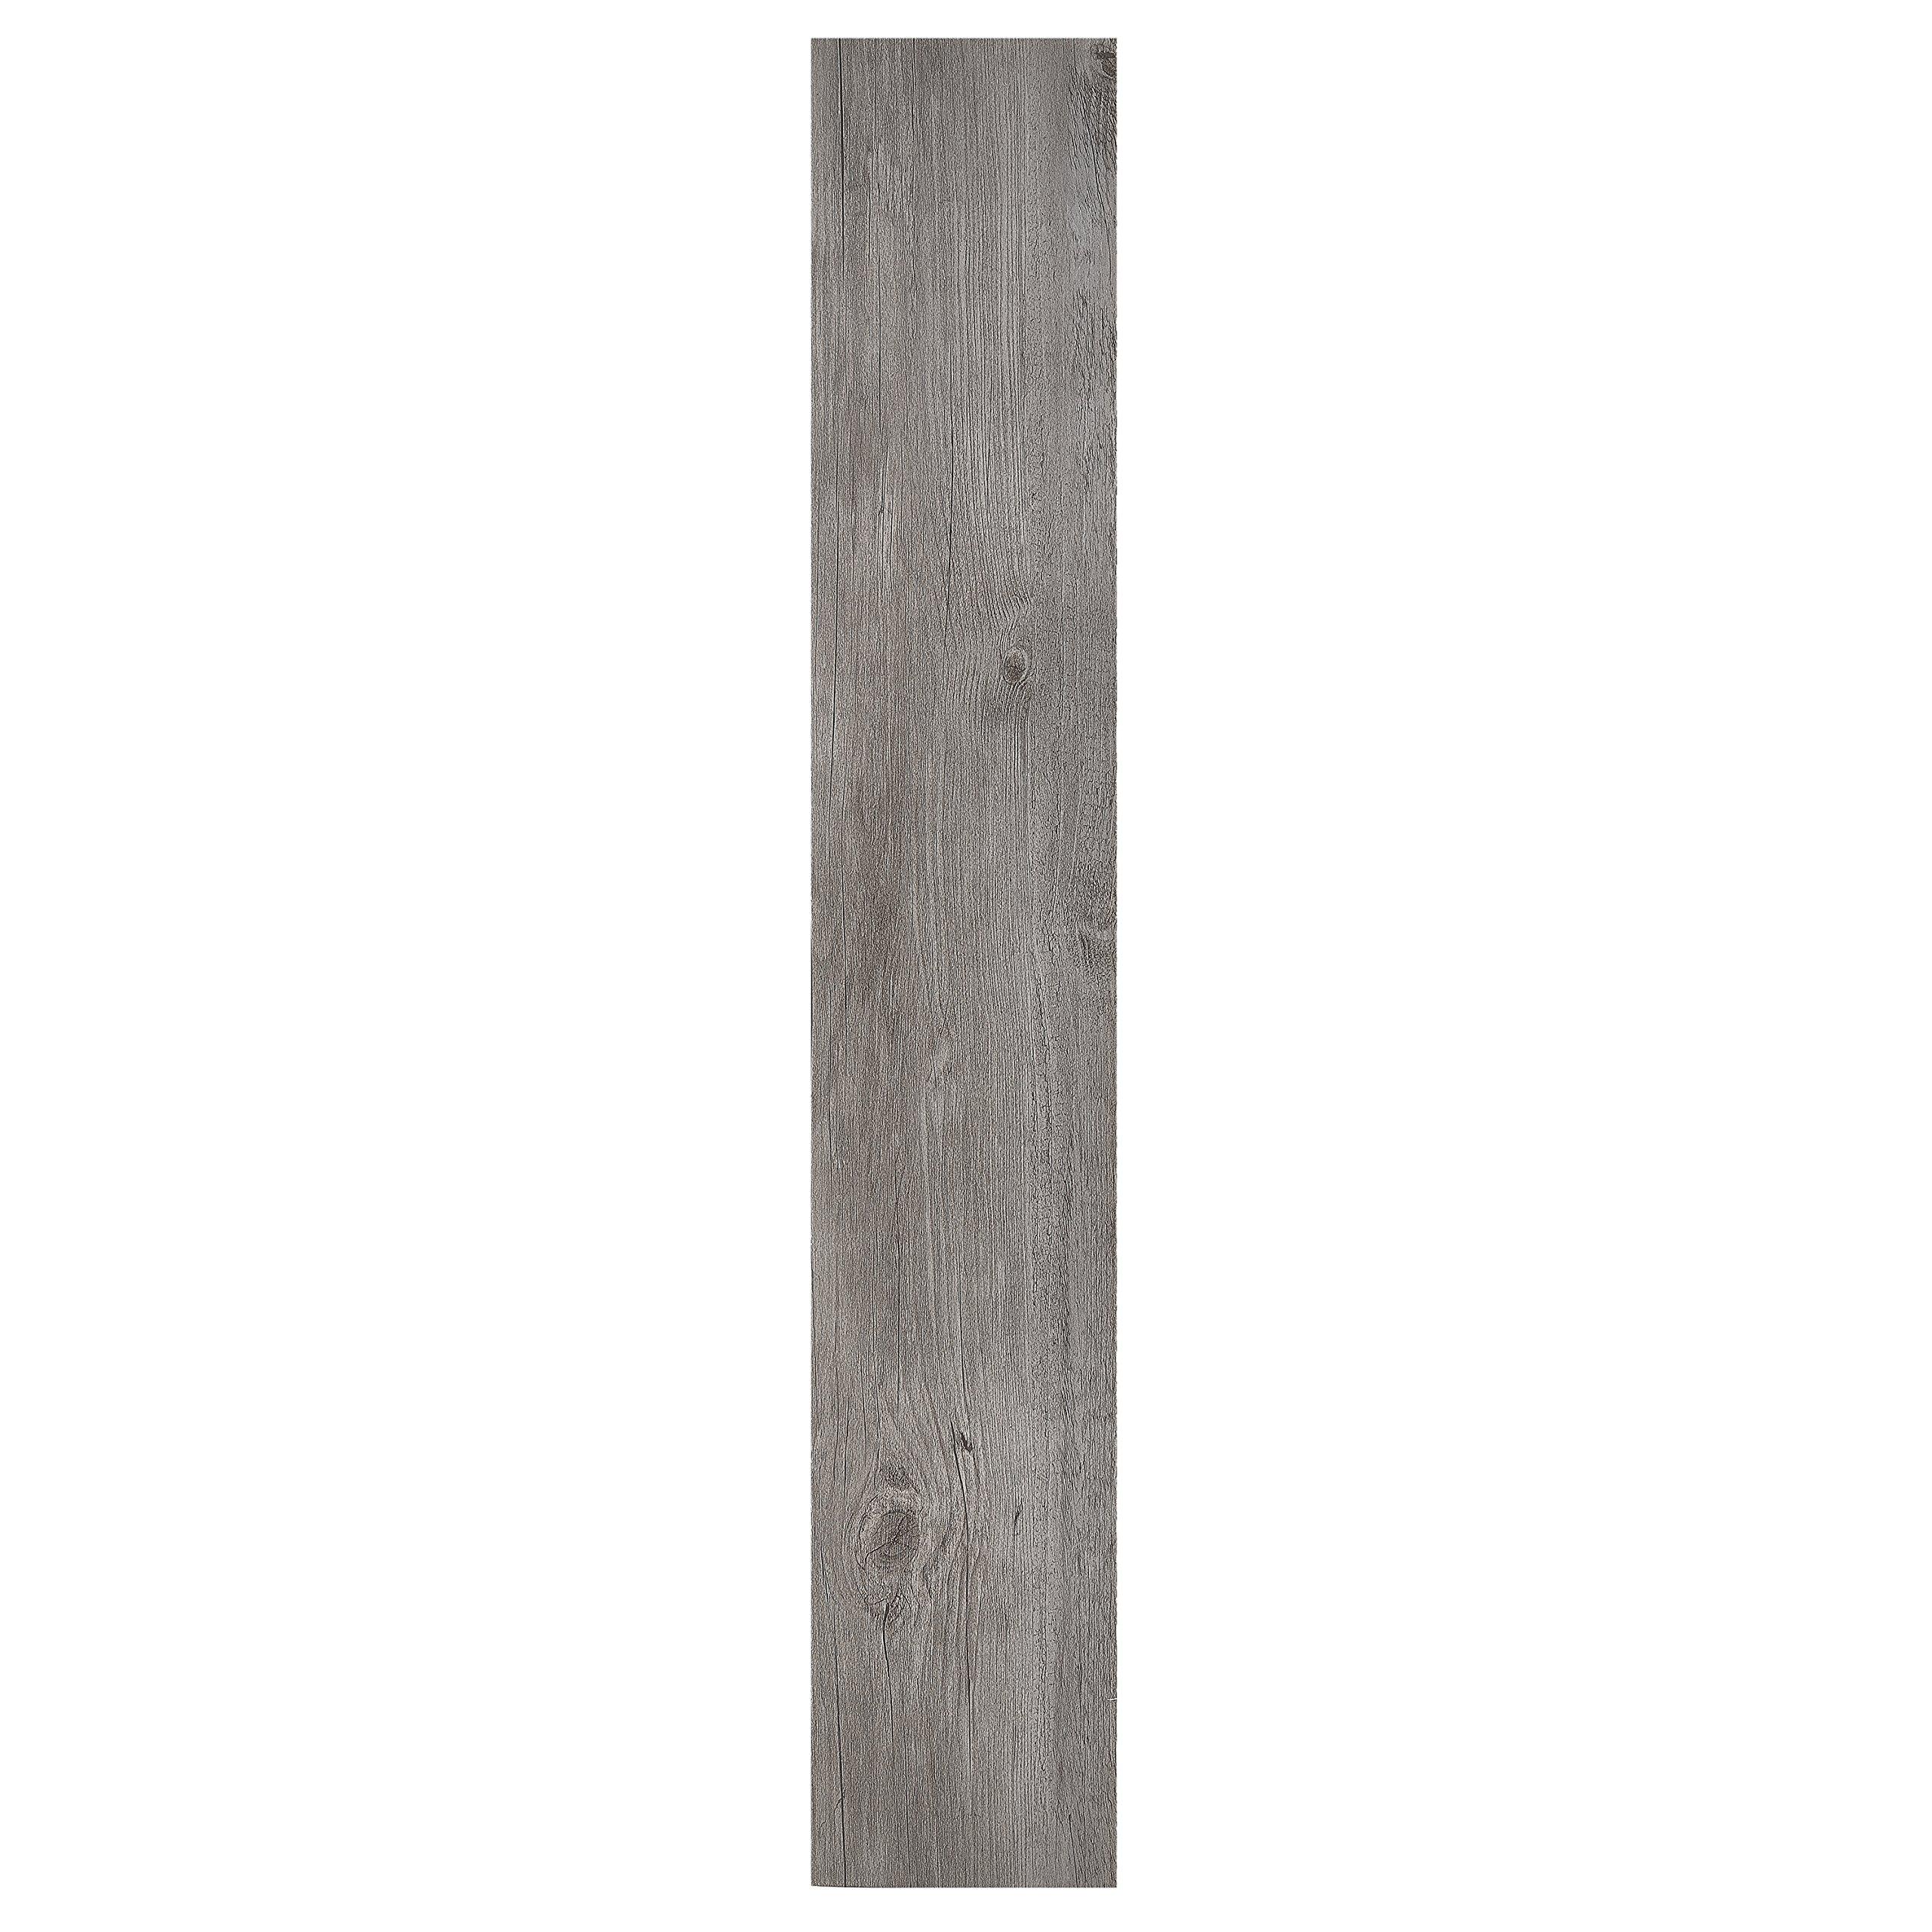 Achim Home Furnishings Achig VFP1.2GO10 Nexus 1.2Mm Vinyl Floor Planks, 6 Inches x 36 Inches, Light Grey Oak by Achim Home Furnishings